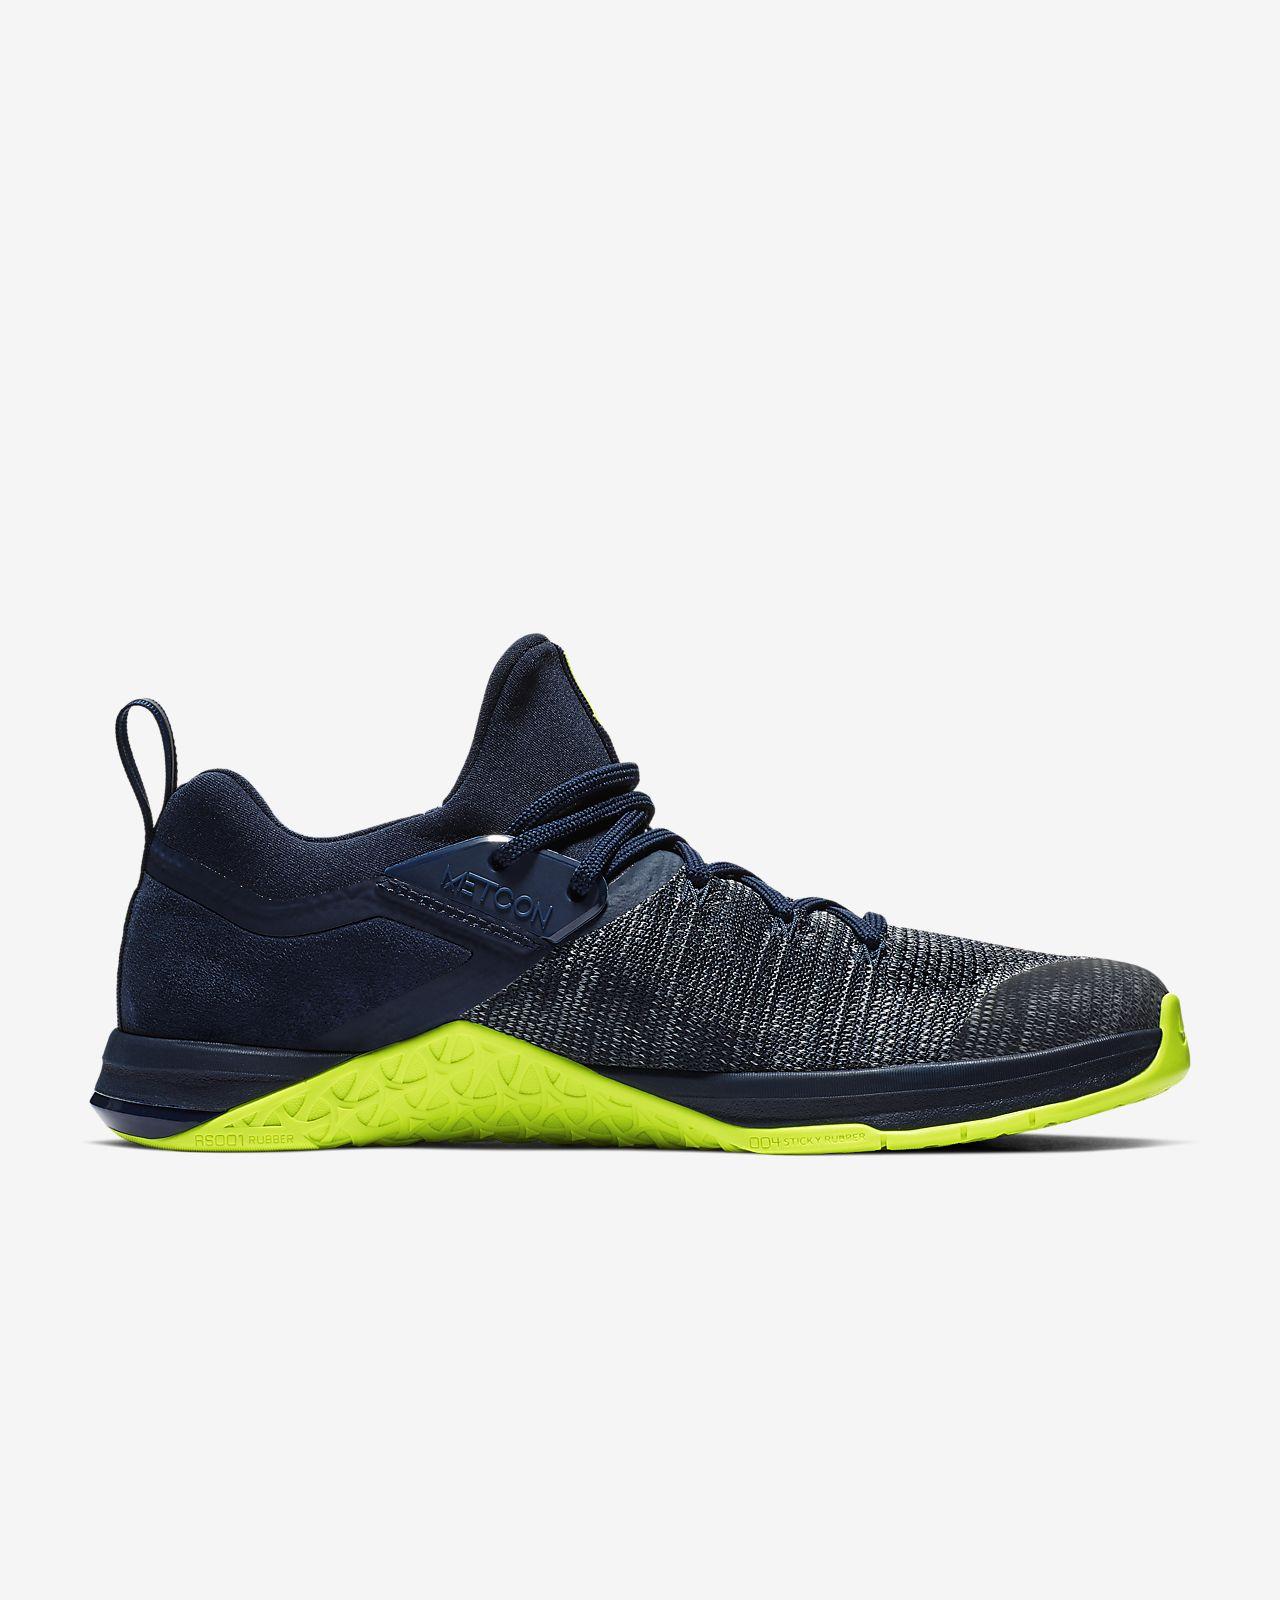 332d6b083ea1a Nike Metcon Flyknit 3 Men s Cross-Training Weightlifting Shoe. Nike ...